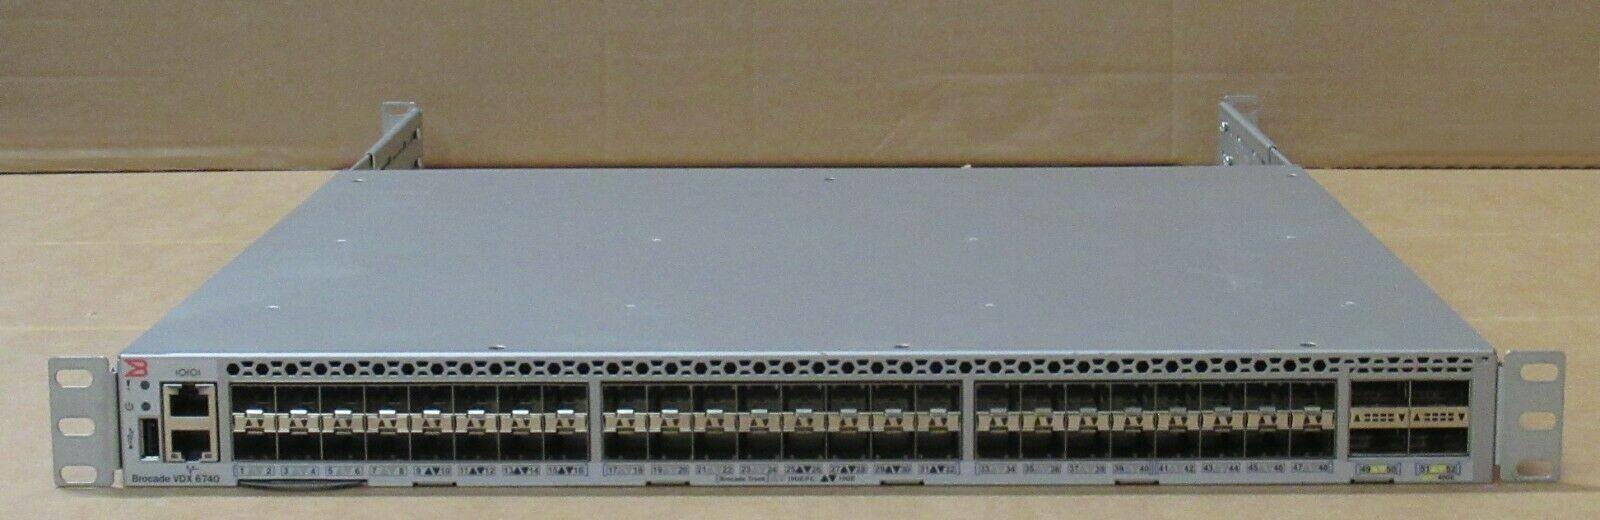 BROCADE VDX-6740-24-r